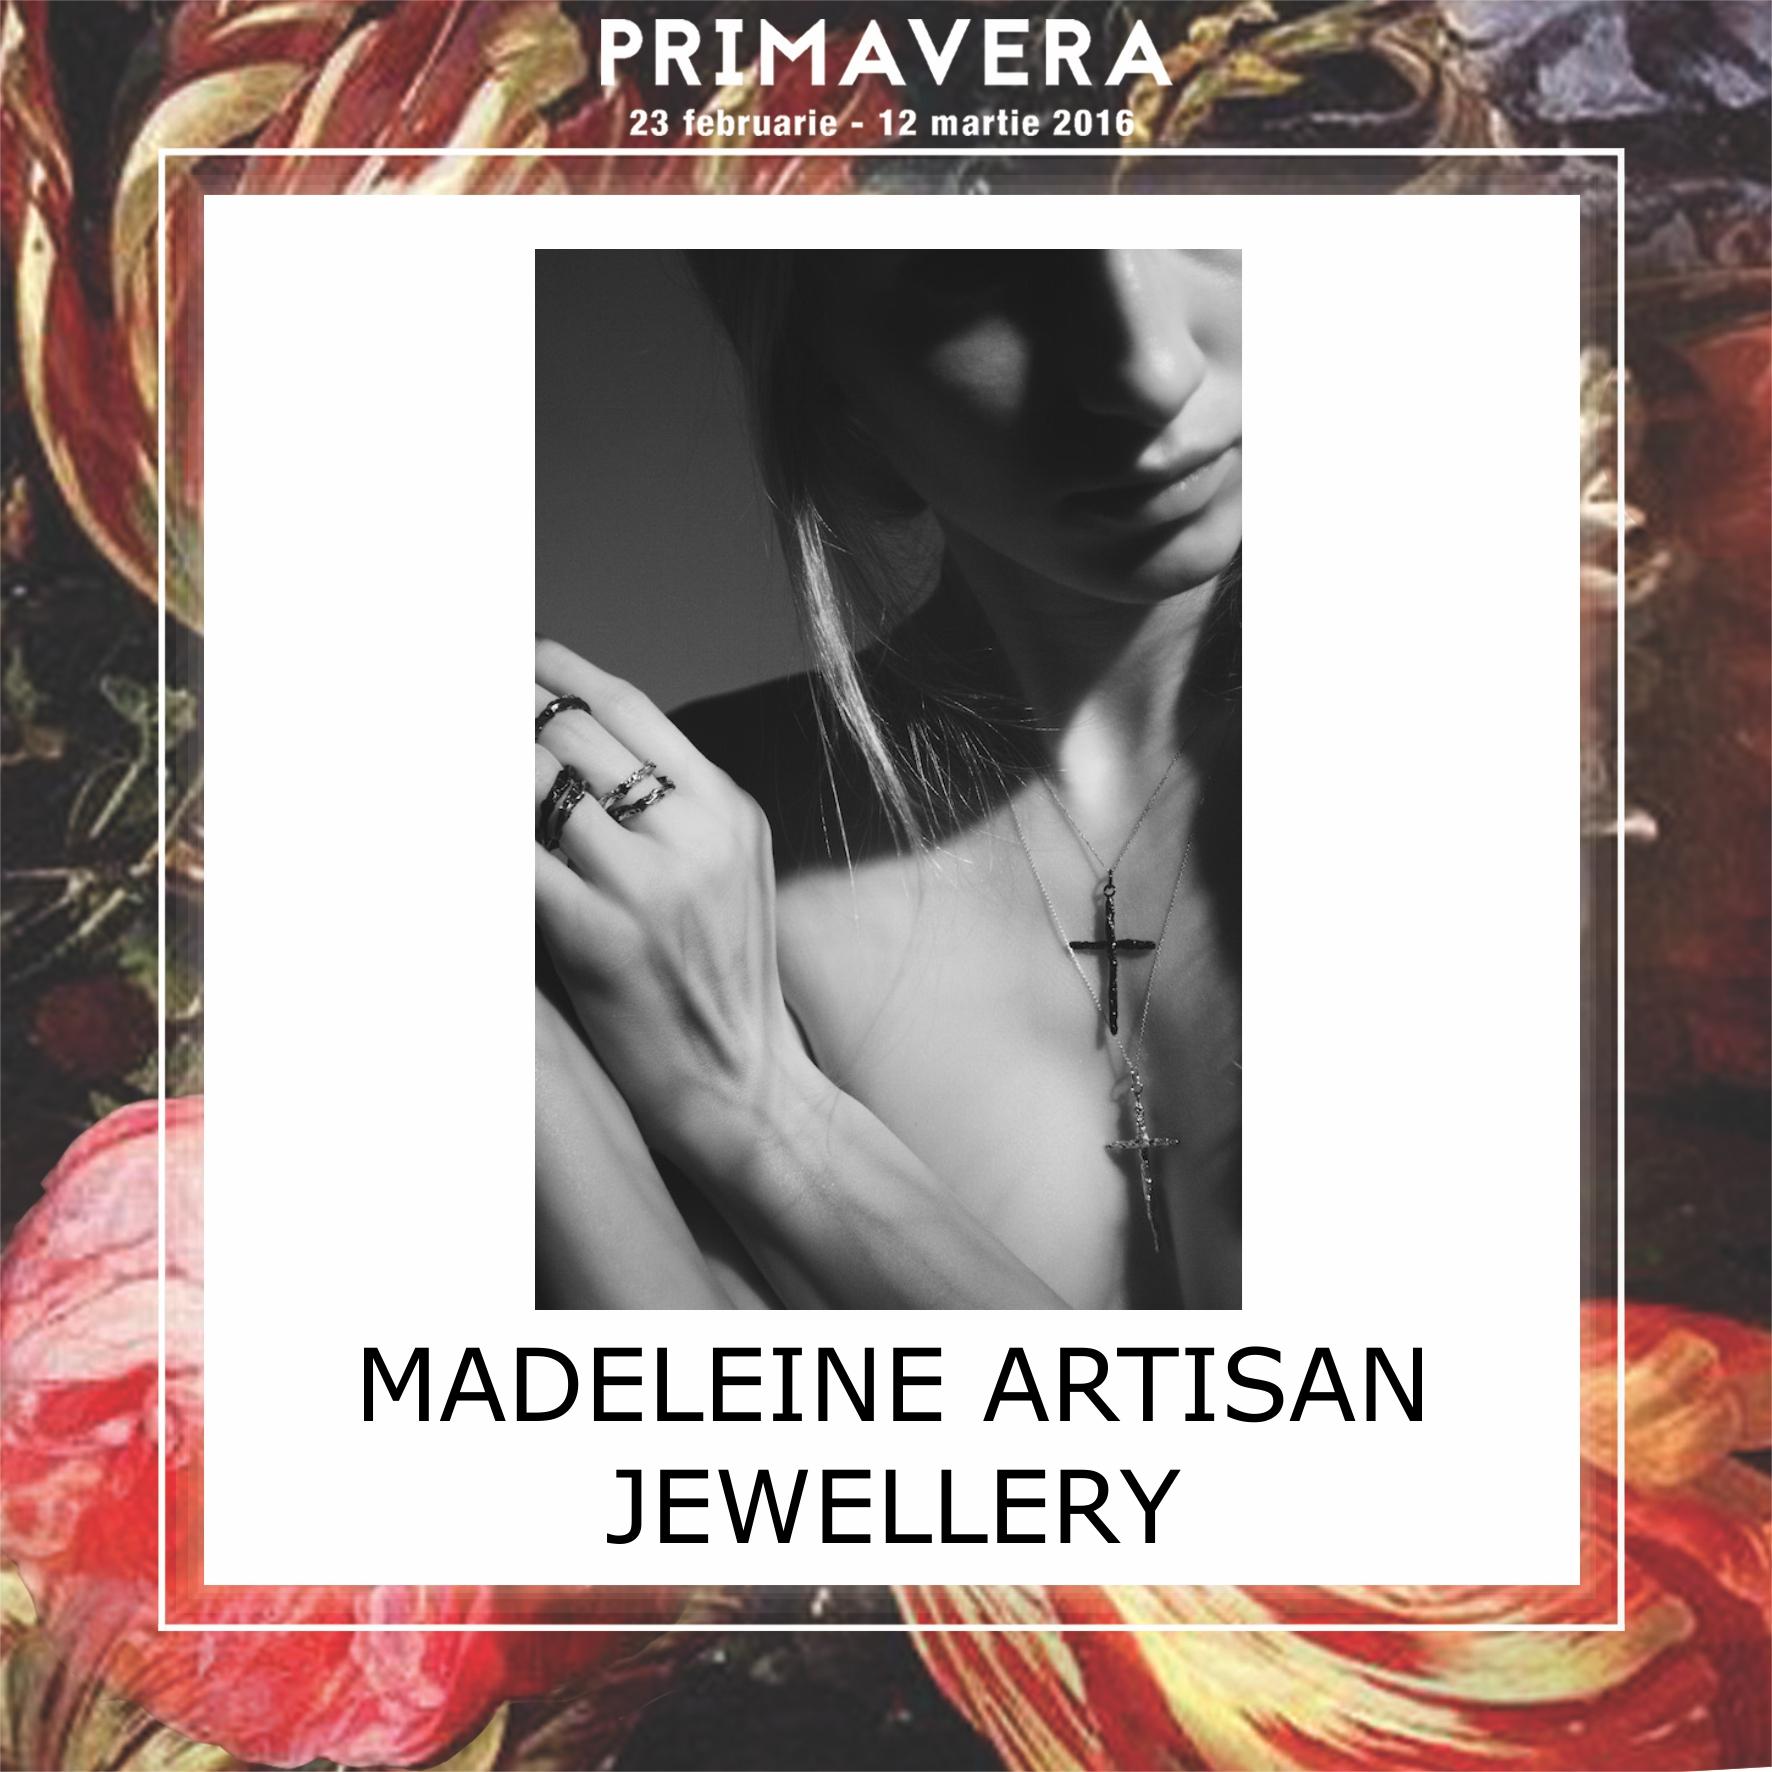 Madeleine Artisan